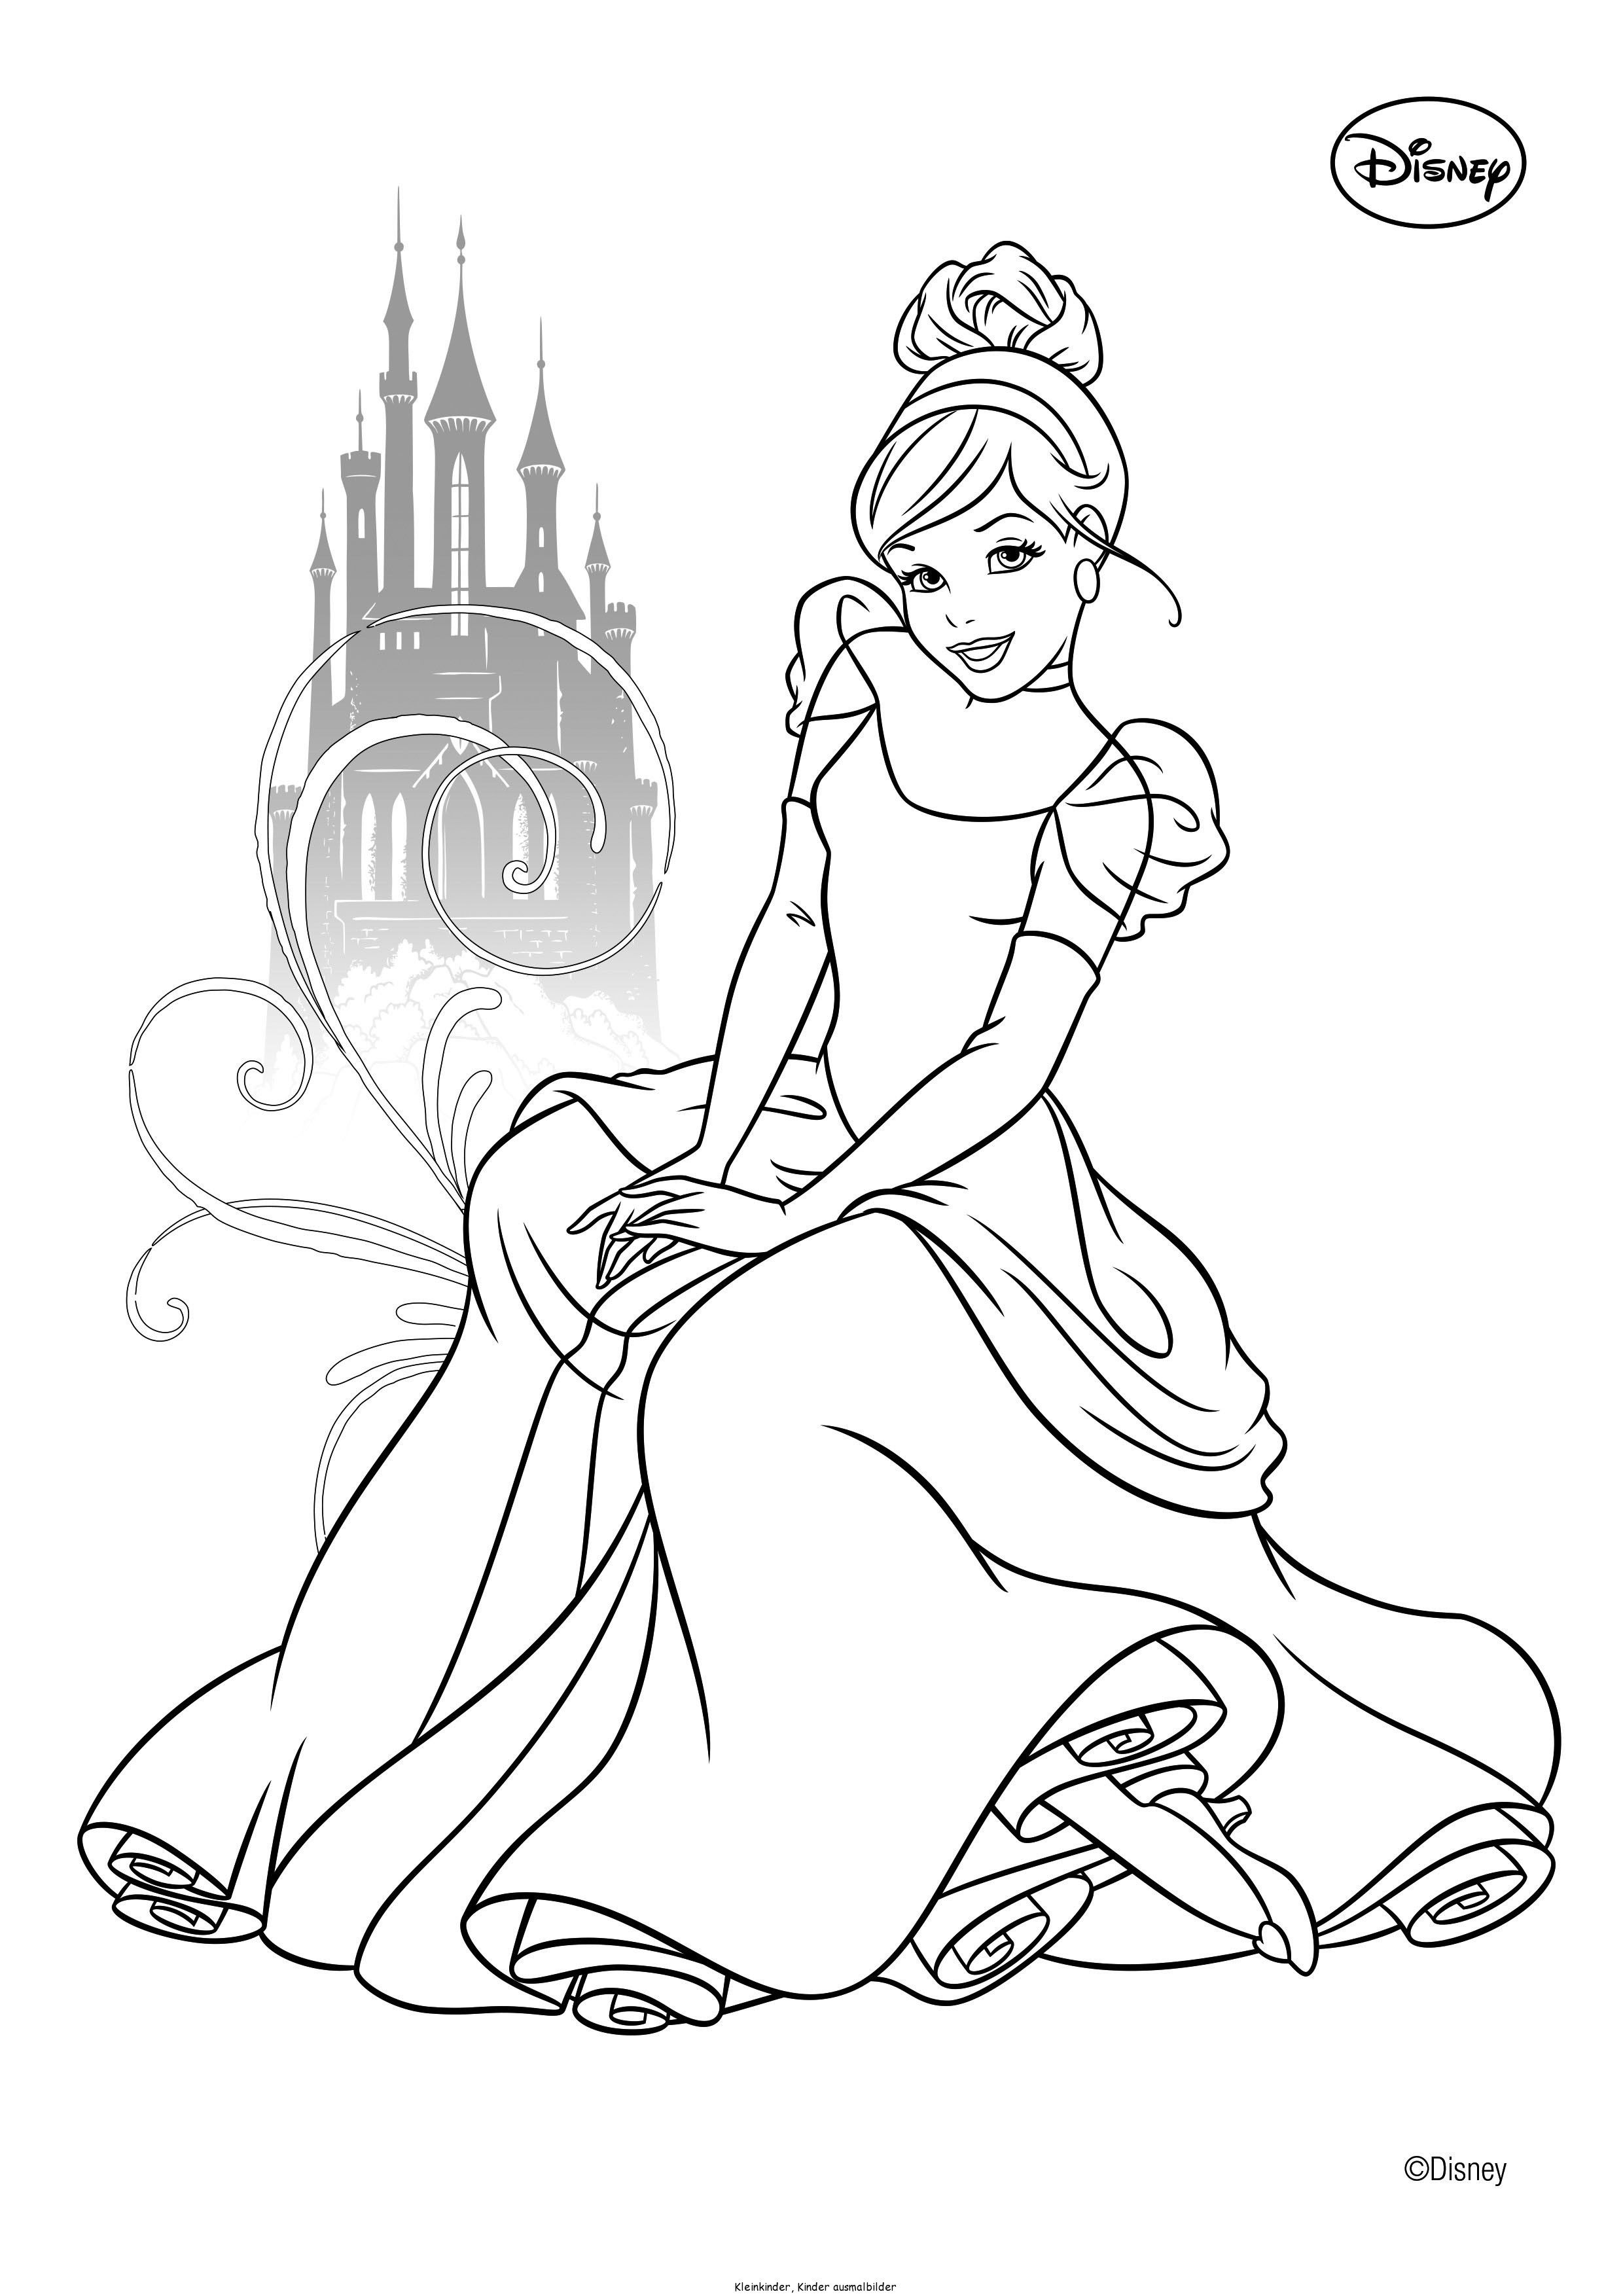 Disney Ausmalbilder Belle : Cindirella Ausmalbilder Ausmalbilder F R Kinder Ausmalbilder